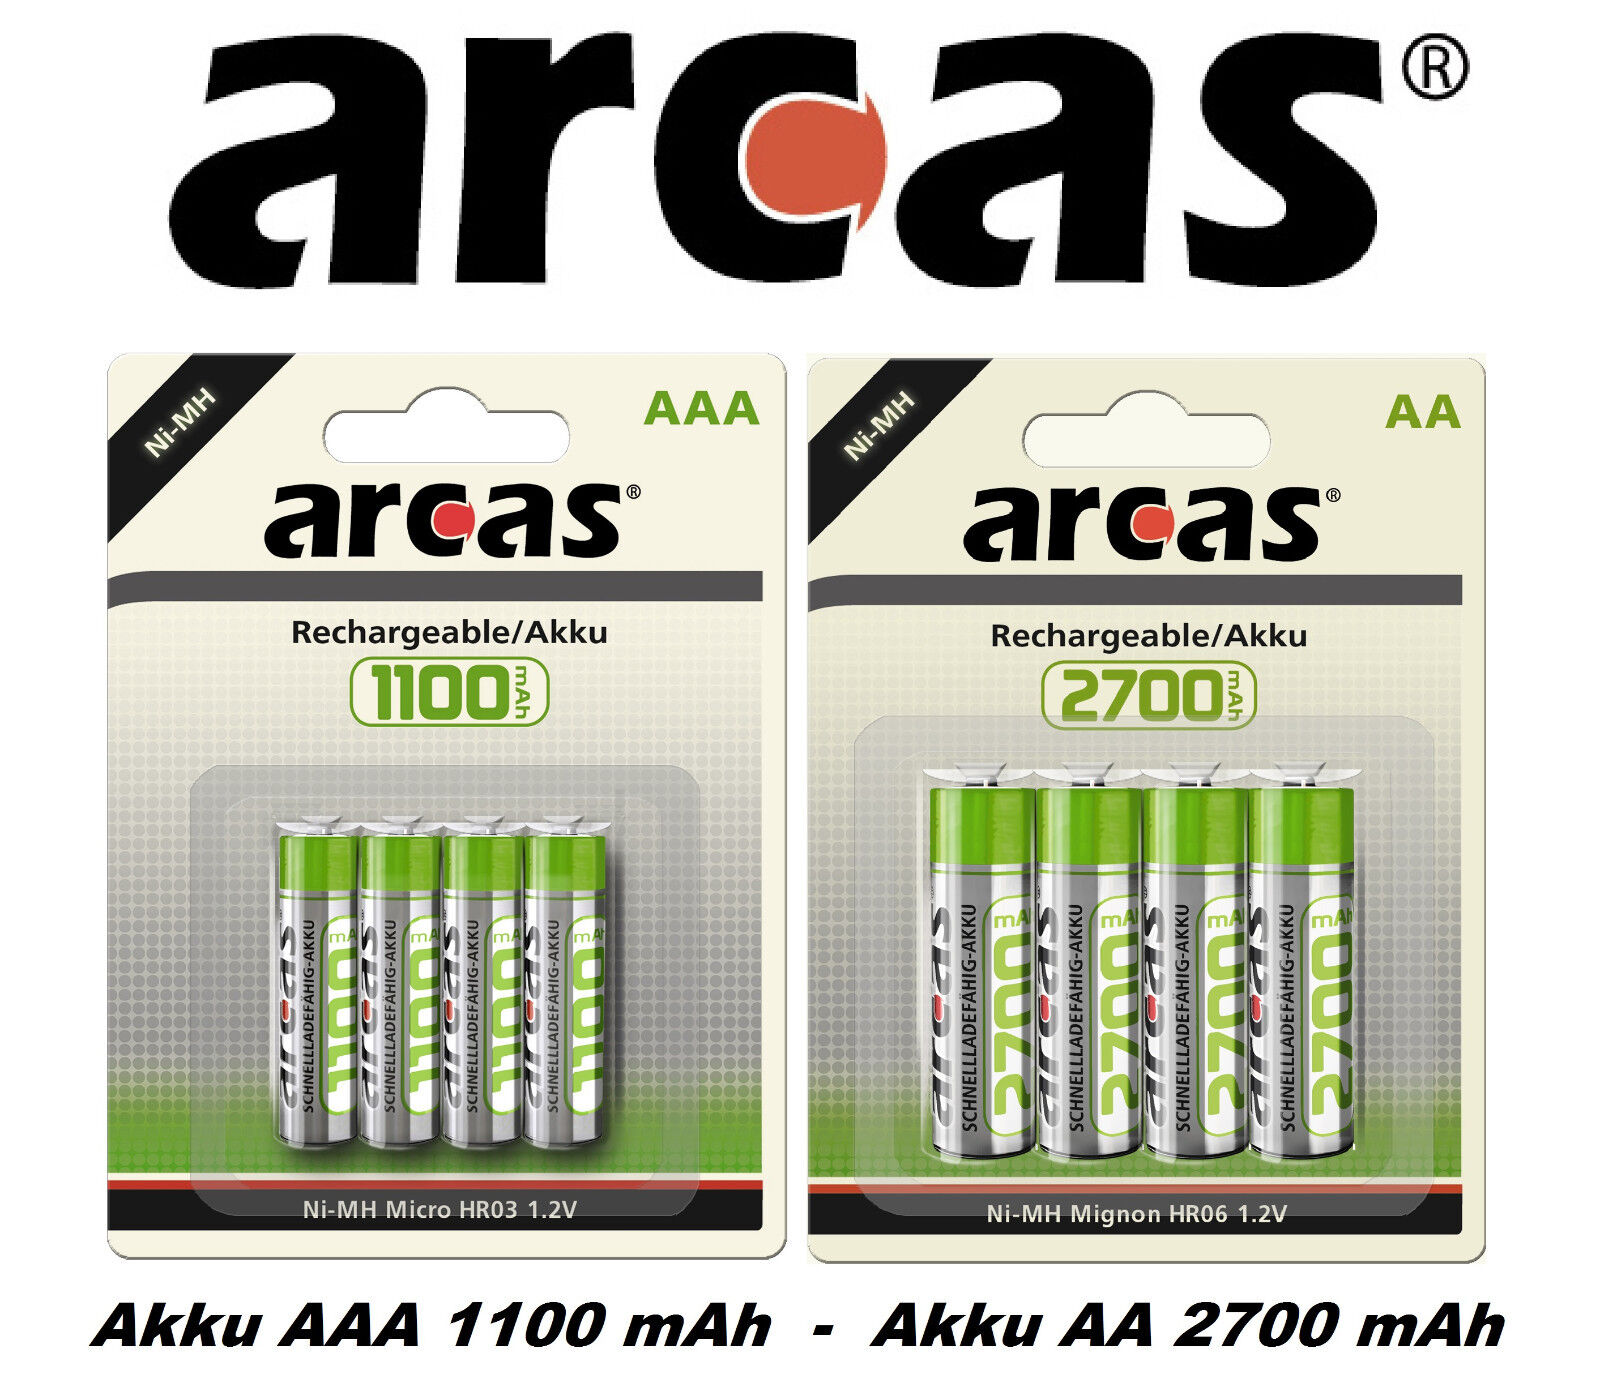 ARCAS AAA 1100mAh Micro - AA 2700mAh Mignon HR06 Batterien Akku Ni-MH Auswahl